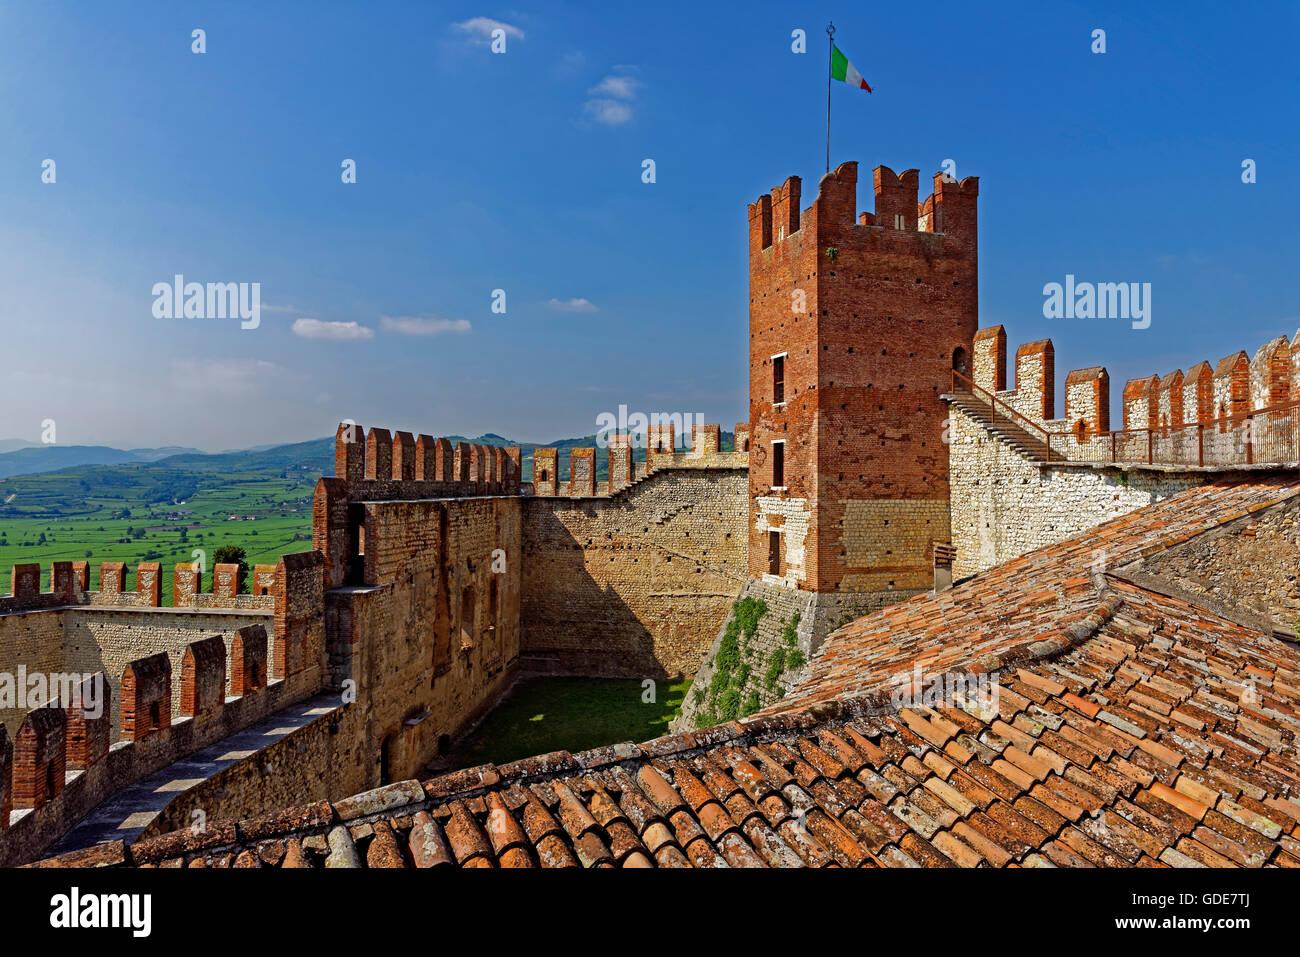 Scalierburg,Castello Medievale,vineyards Stock Photo